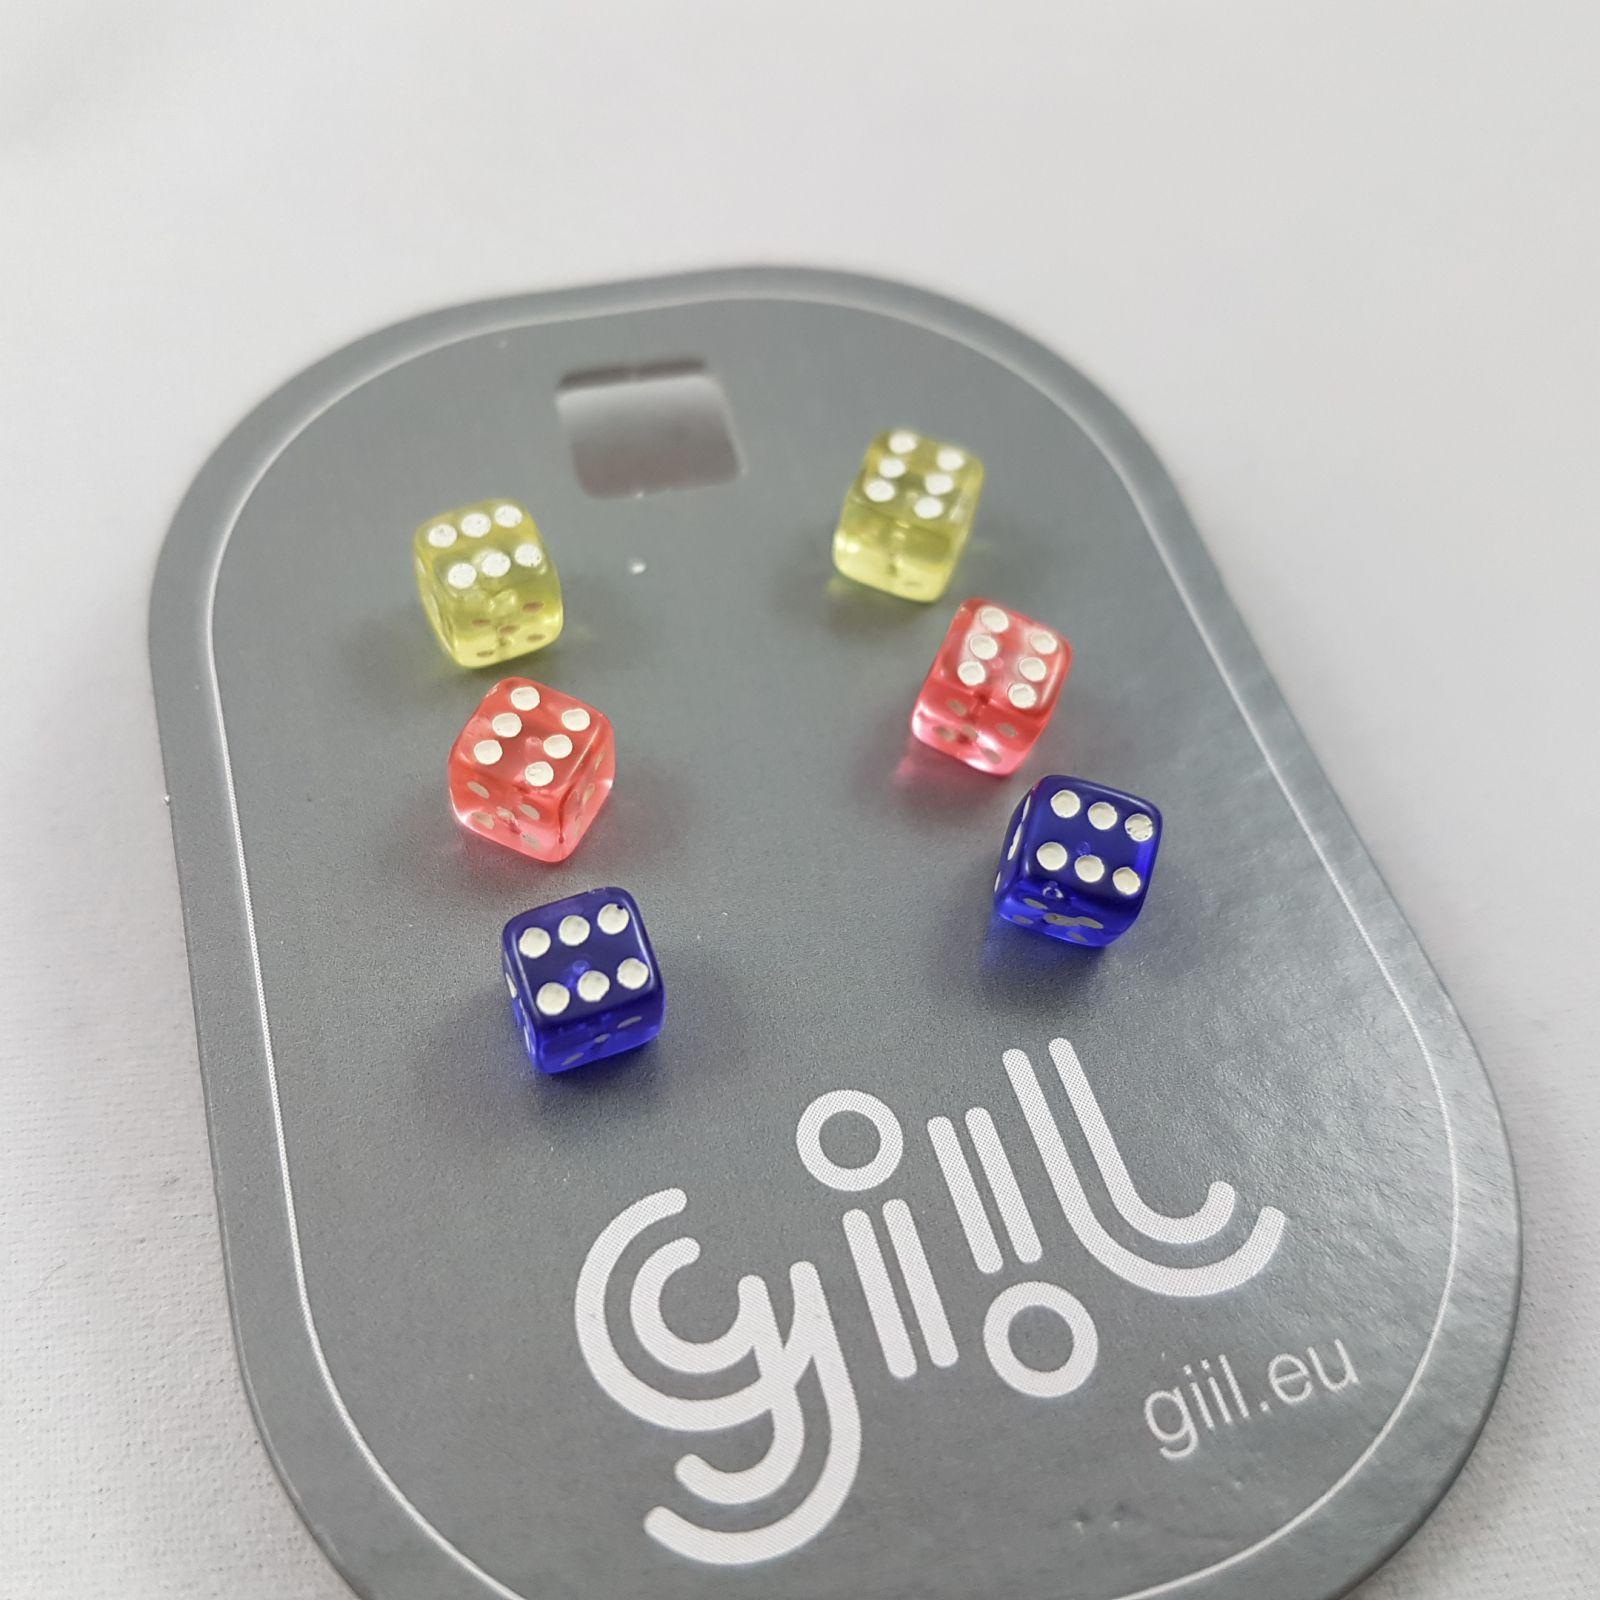 Náušnice v podobě barevných kostek GIIL